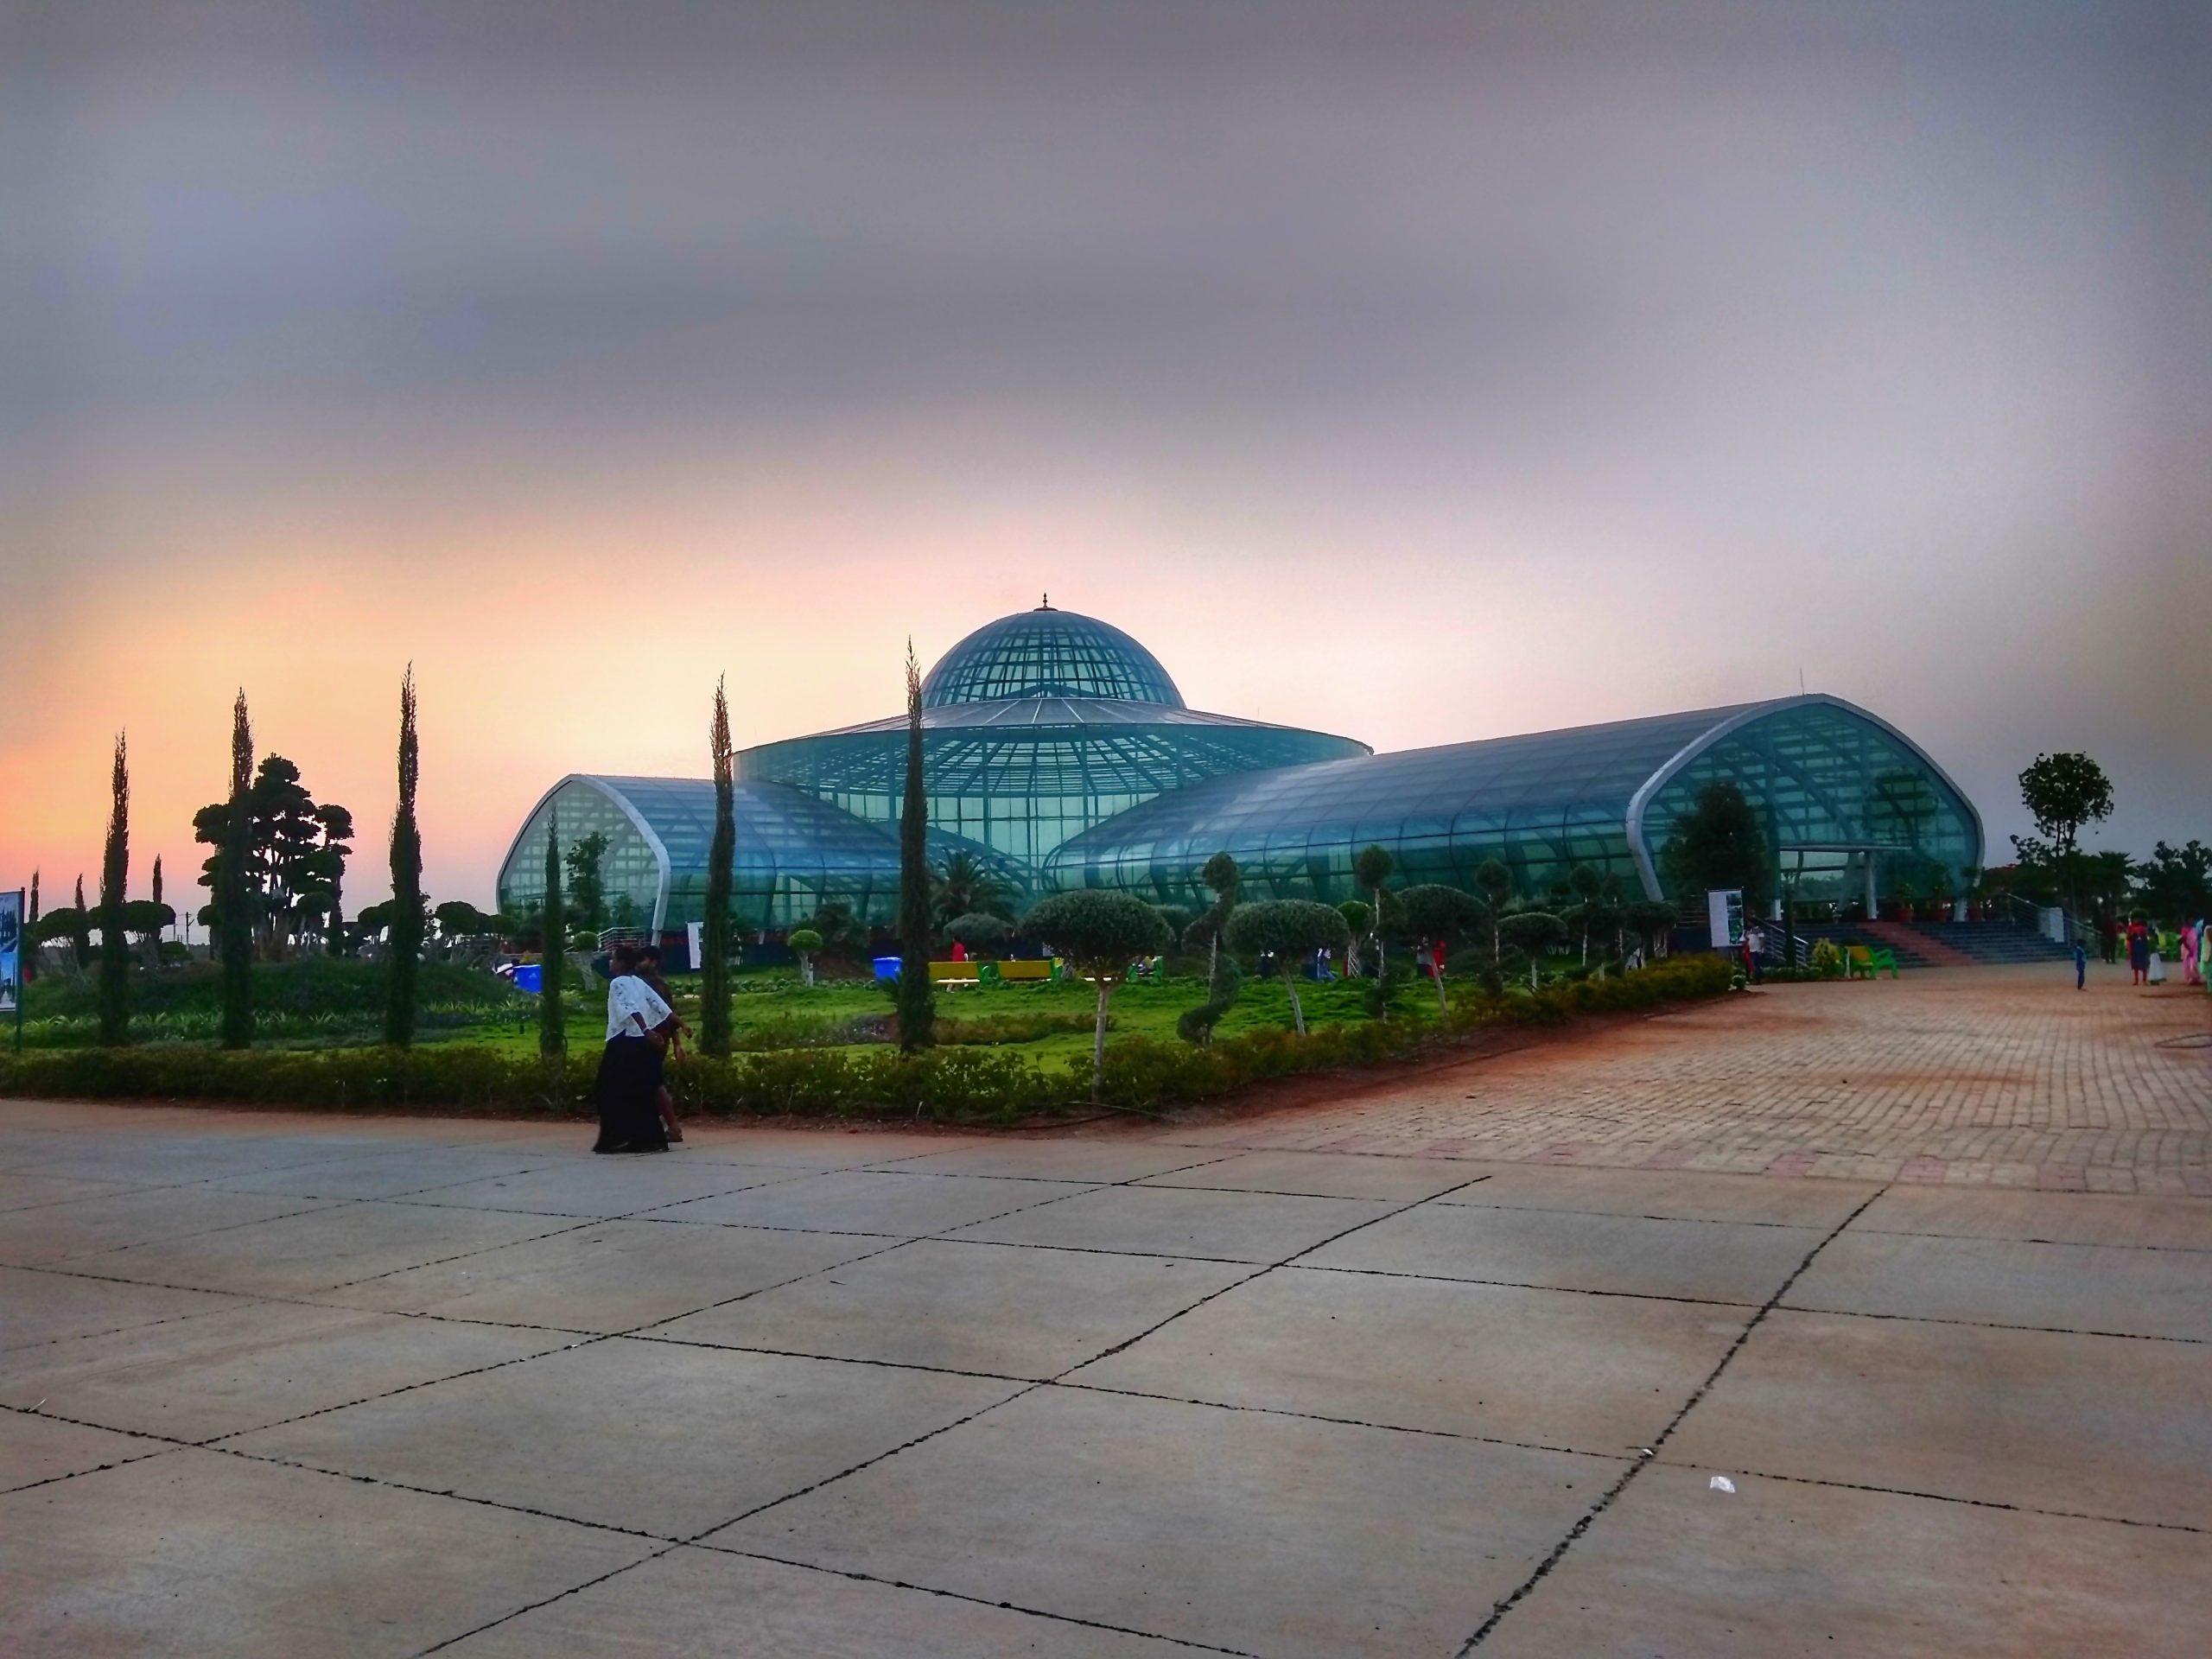 Glass House Garden